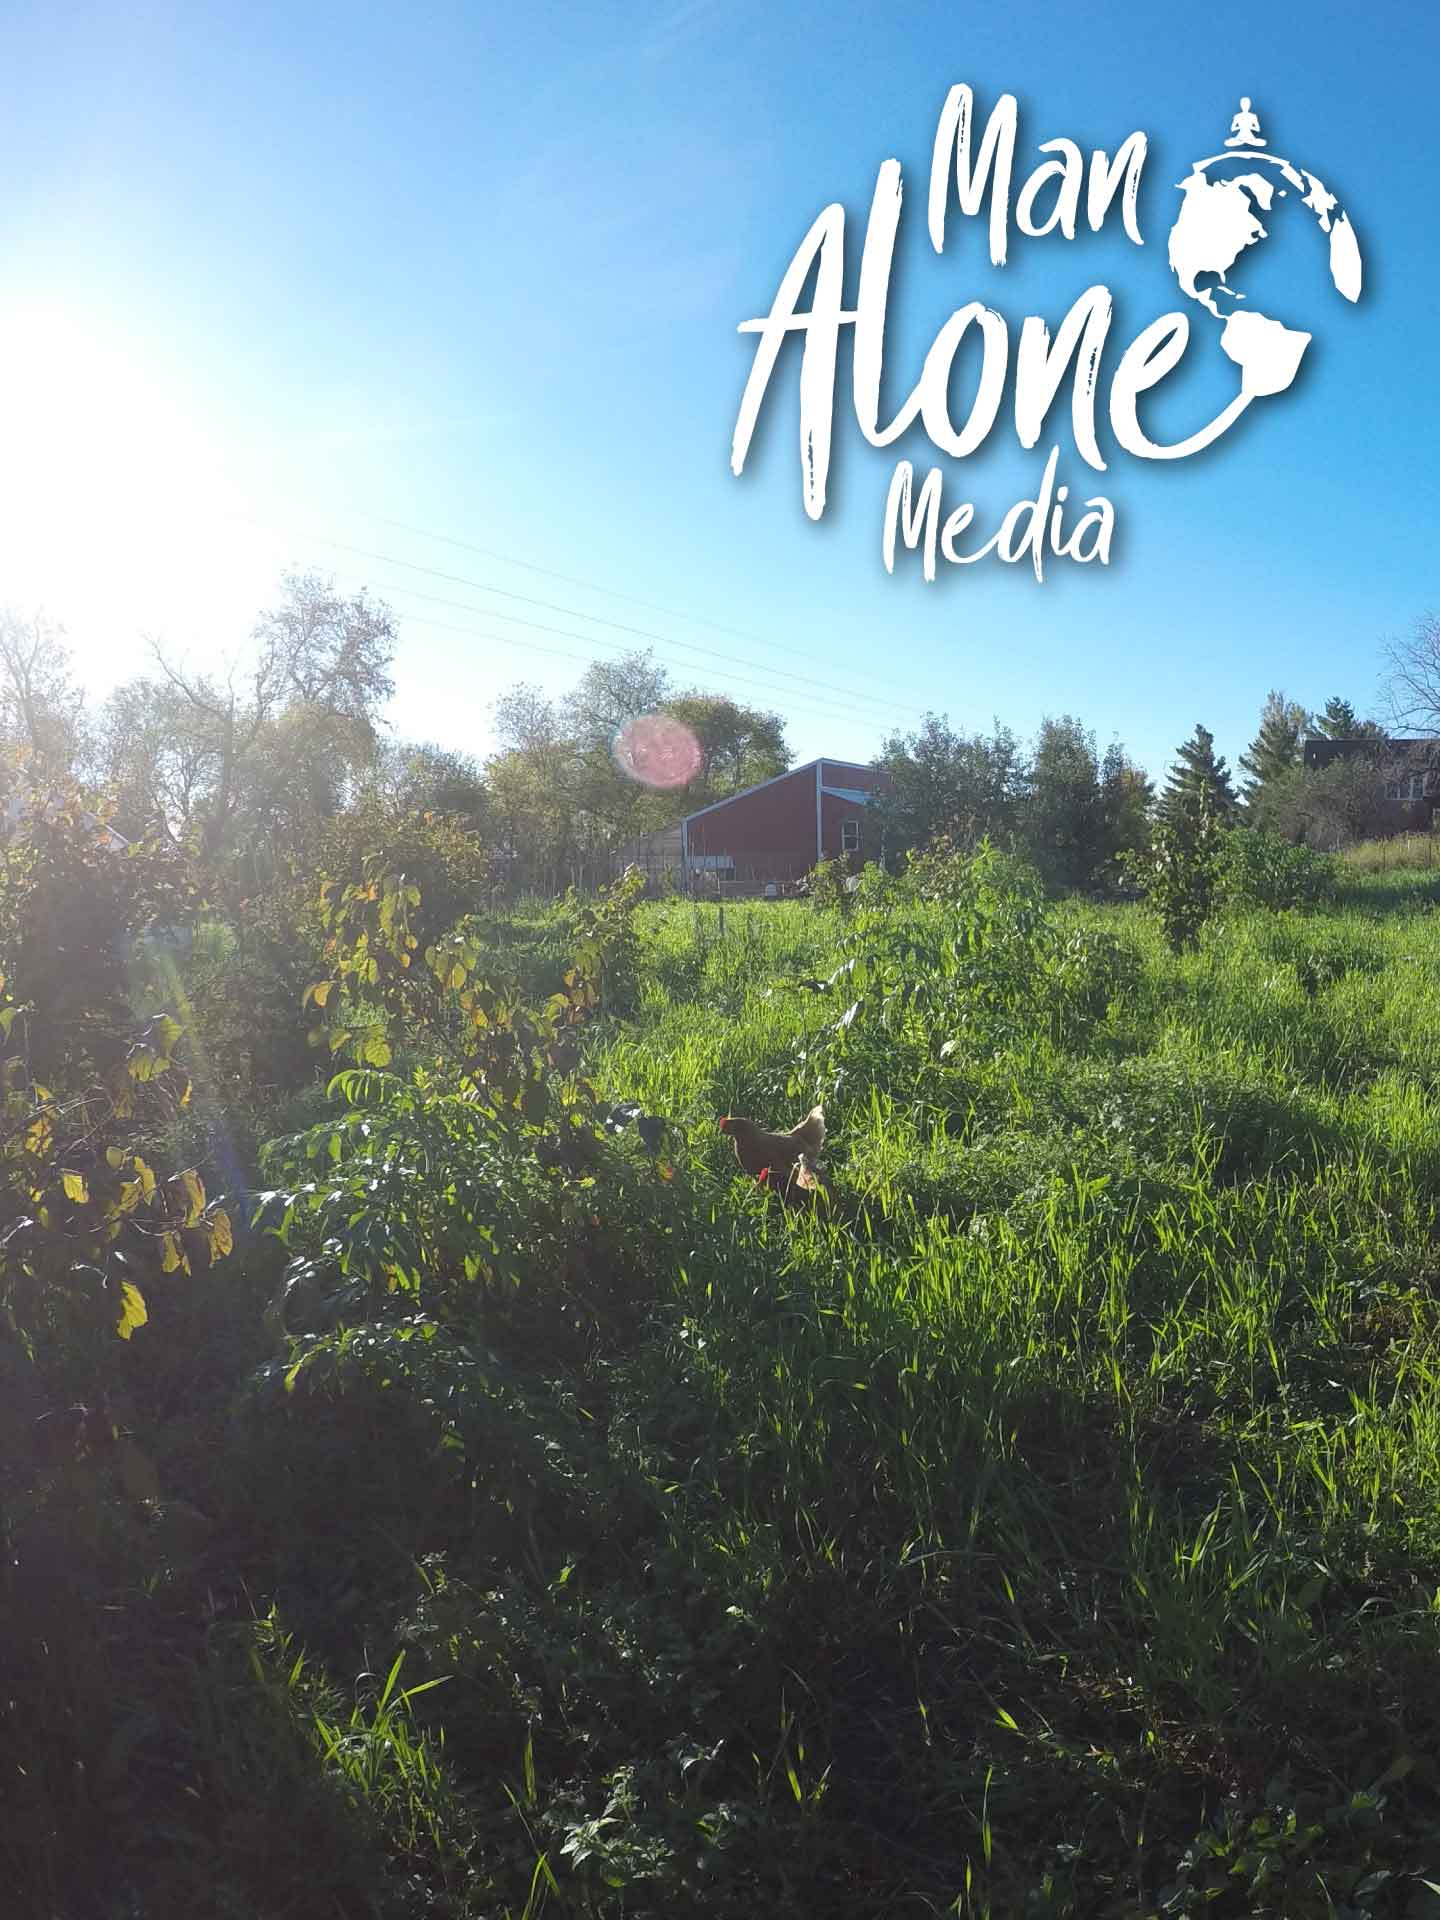 Man-Alone-Media-BANNER1